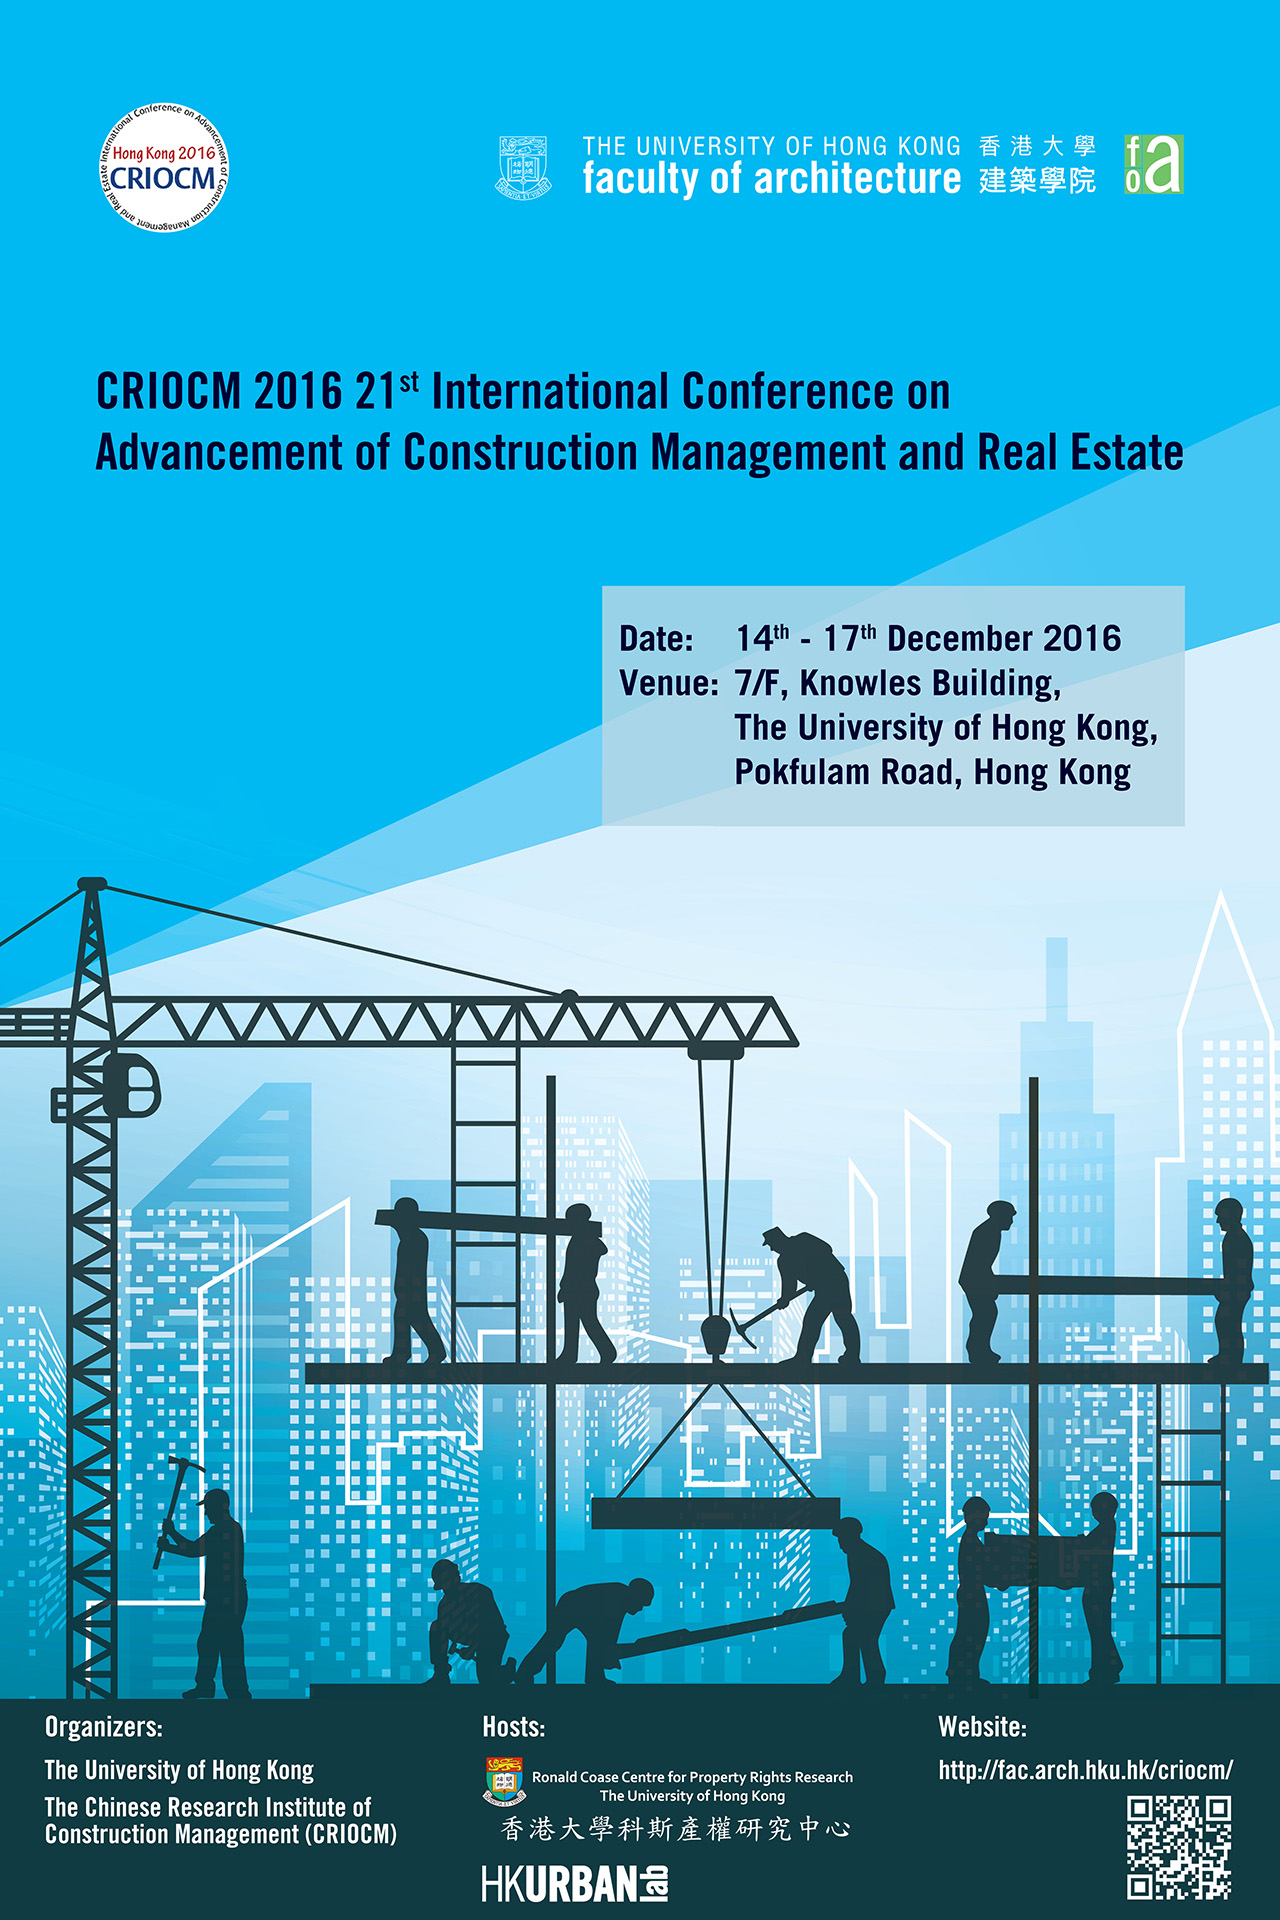 criocm conference information